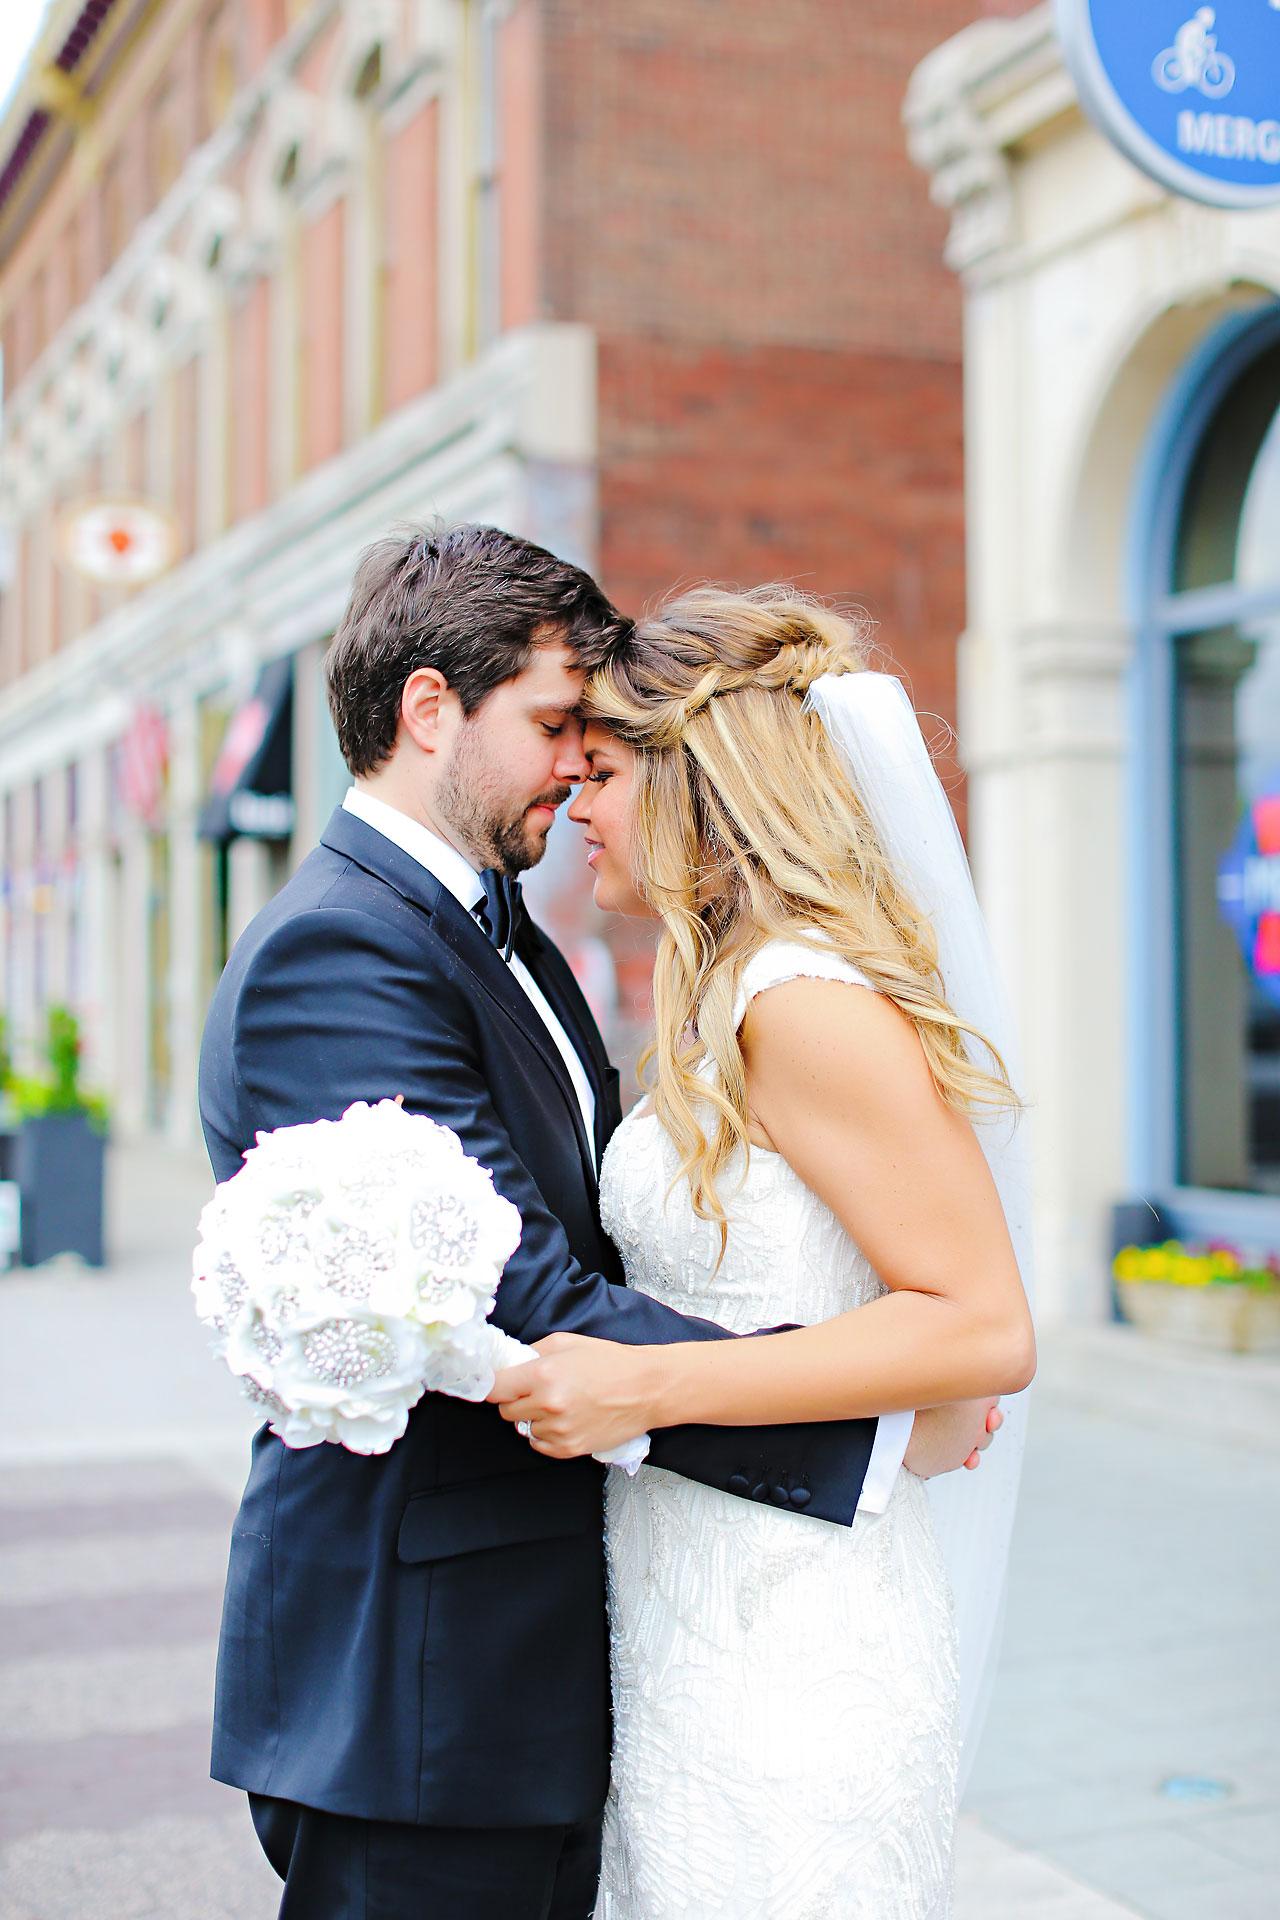 Amy Nick Canal 337 Wedding 095